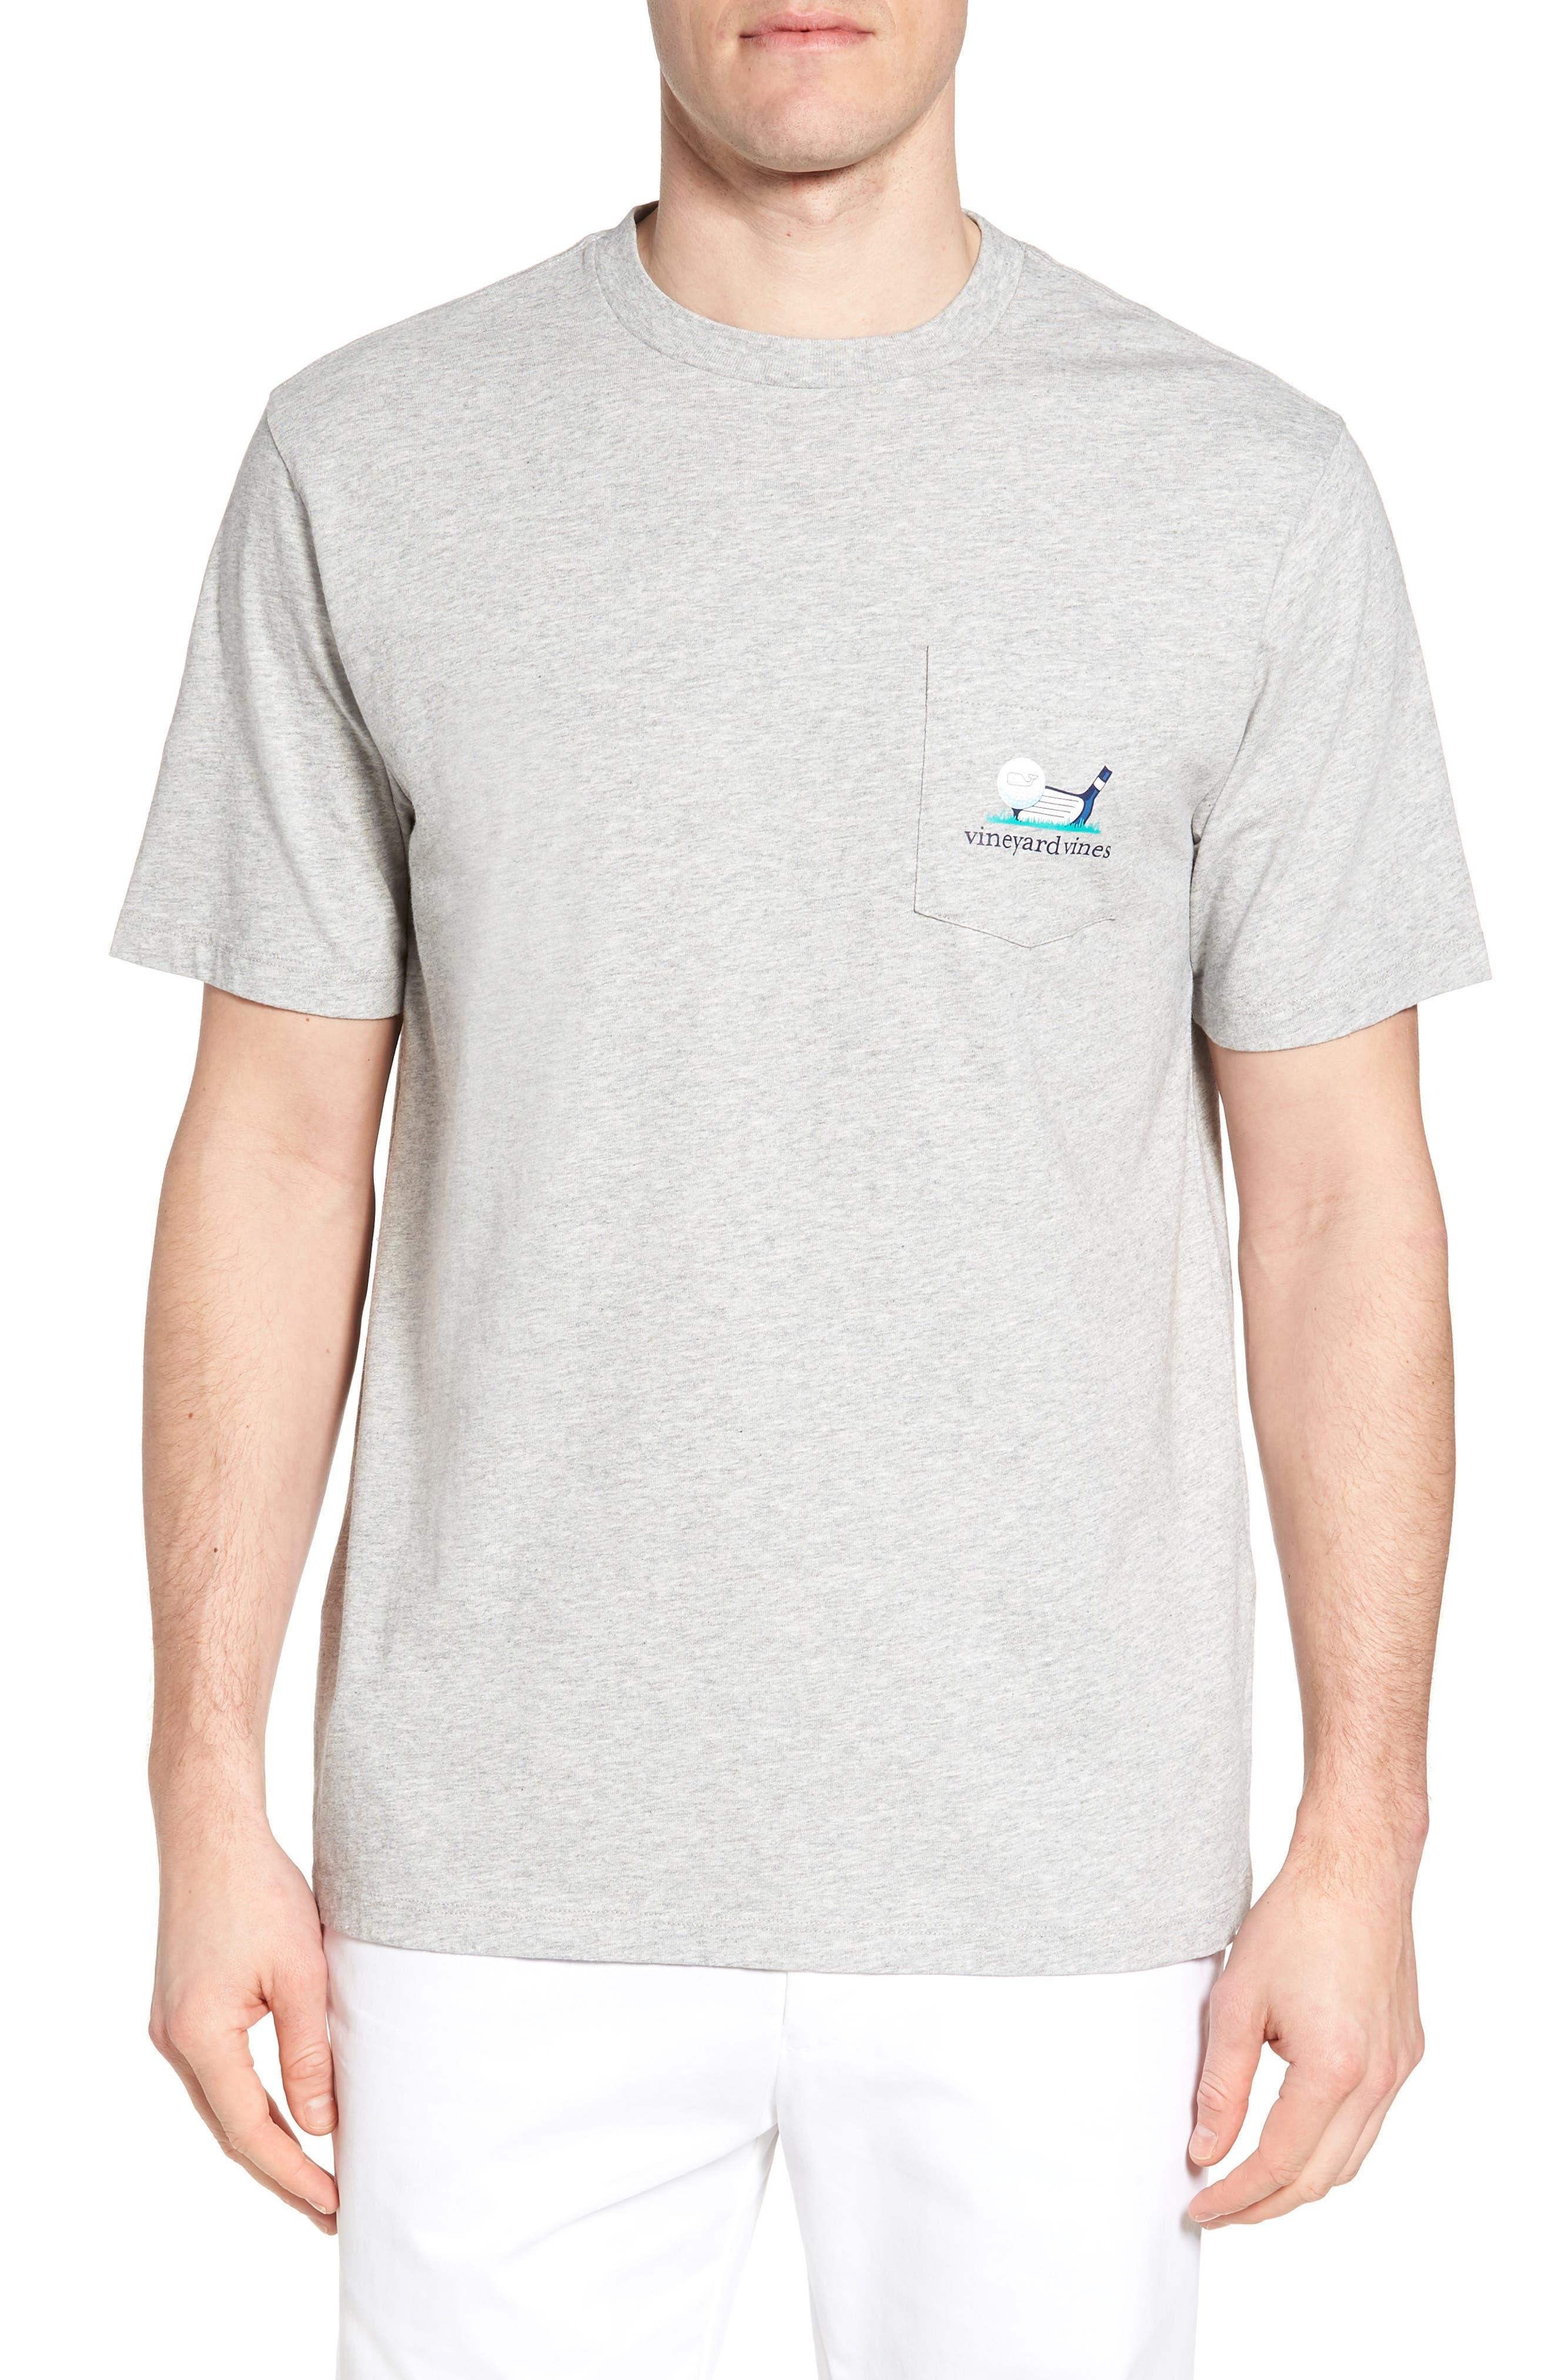 Alternate Image 1 Selected - vineyard vines Regular Fit Golf T-Shirt